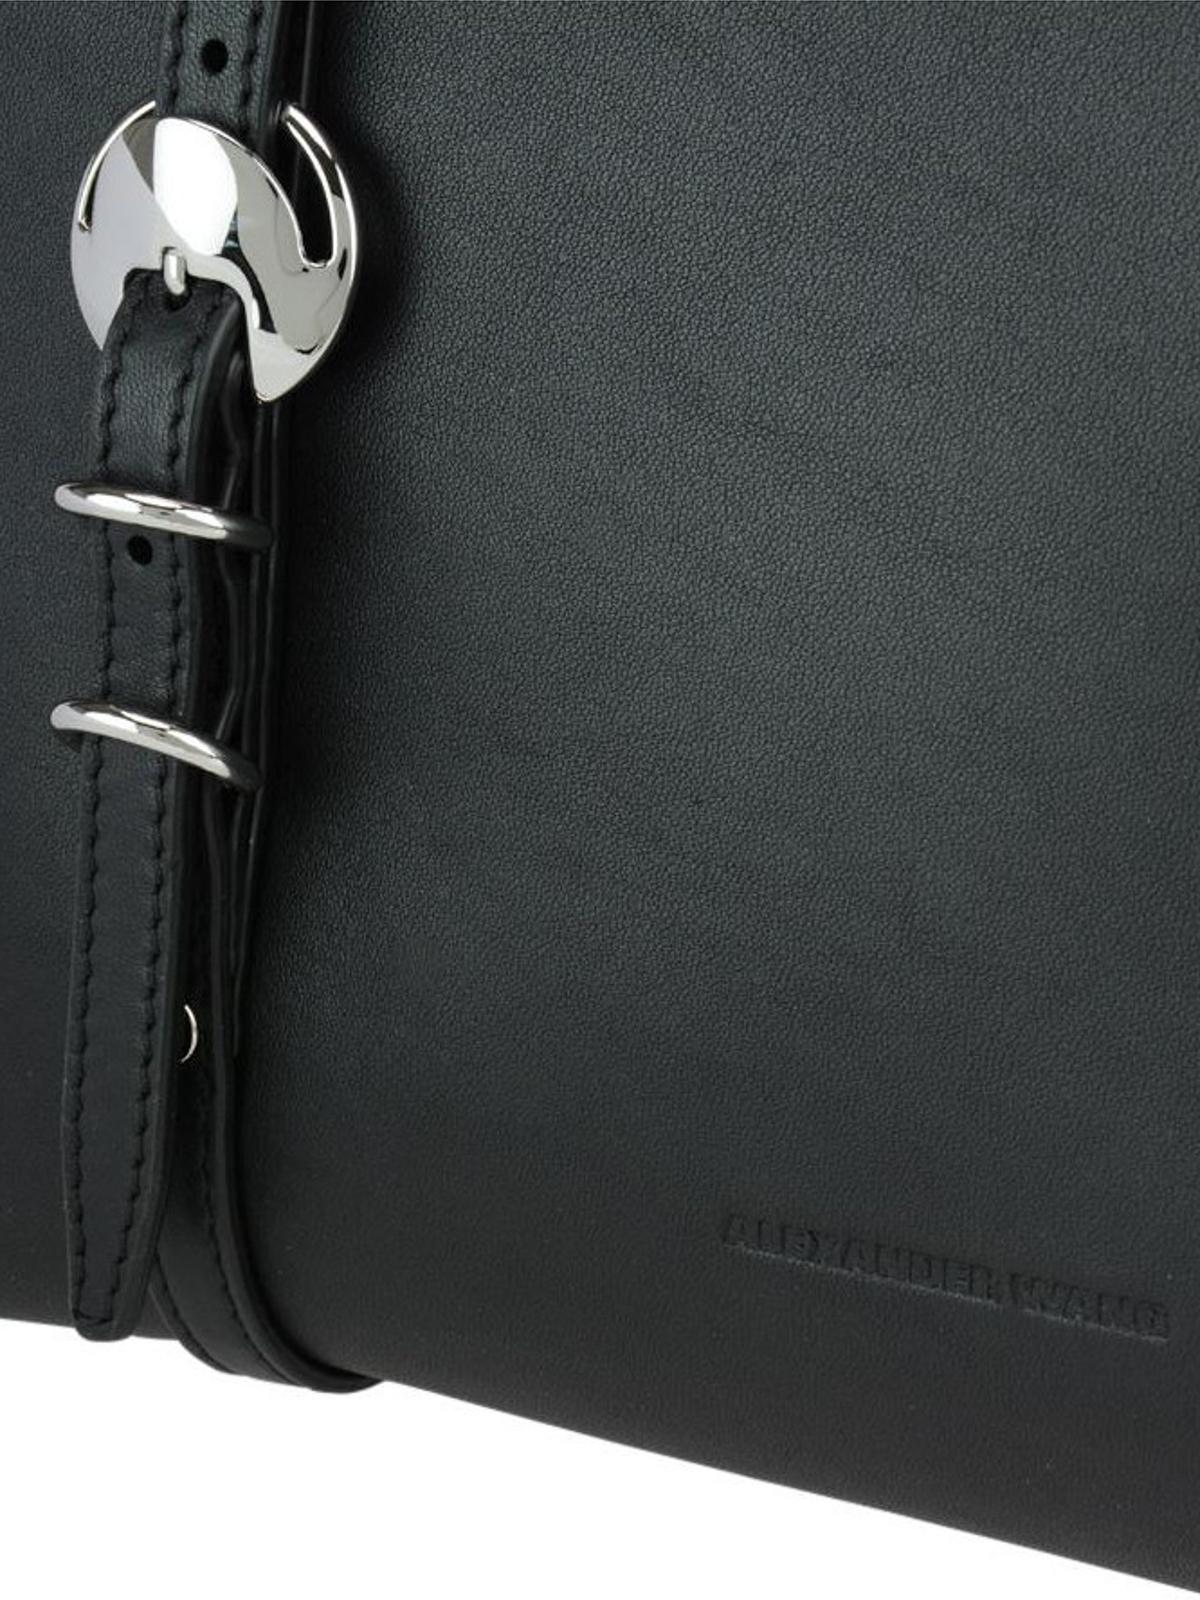 Alexander Wang Ace rings details leather shopper qGPONV